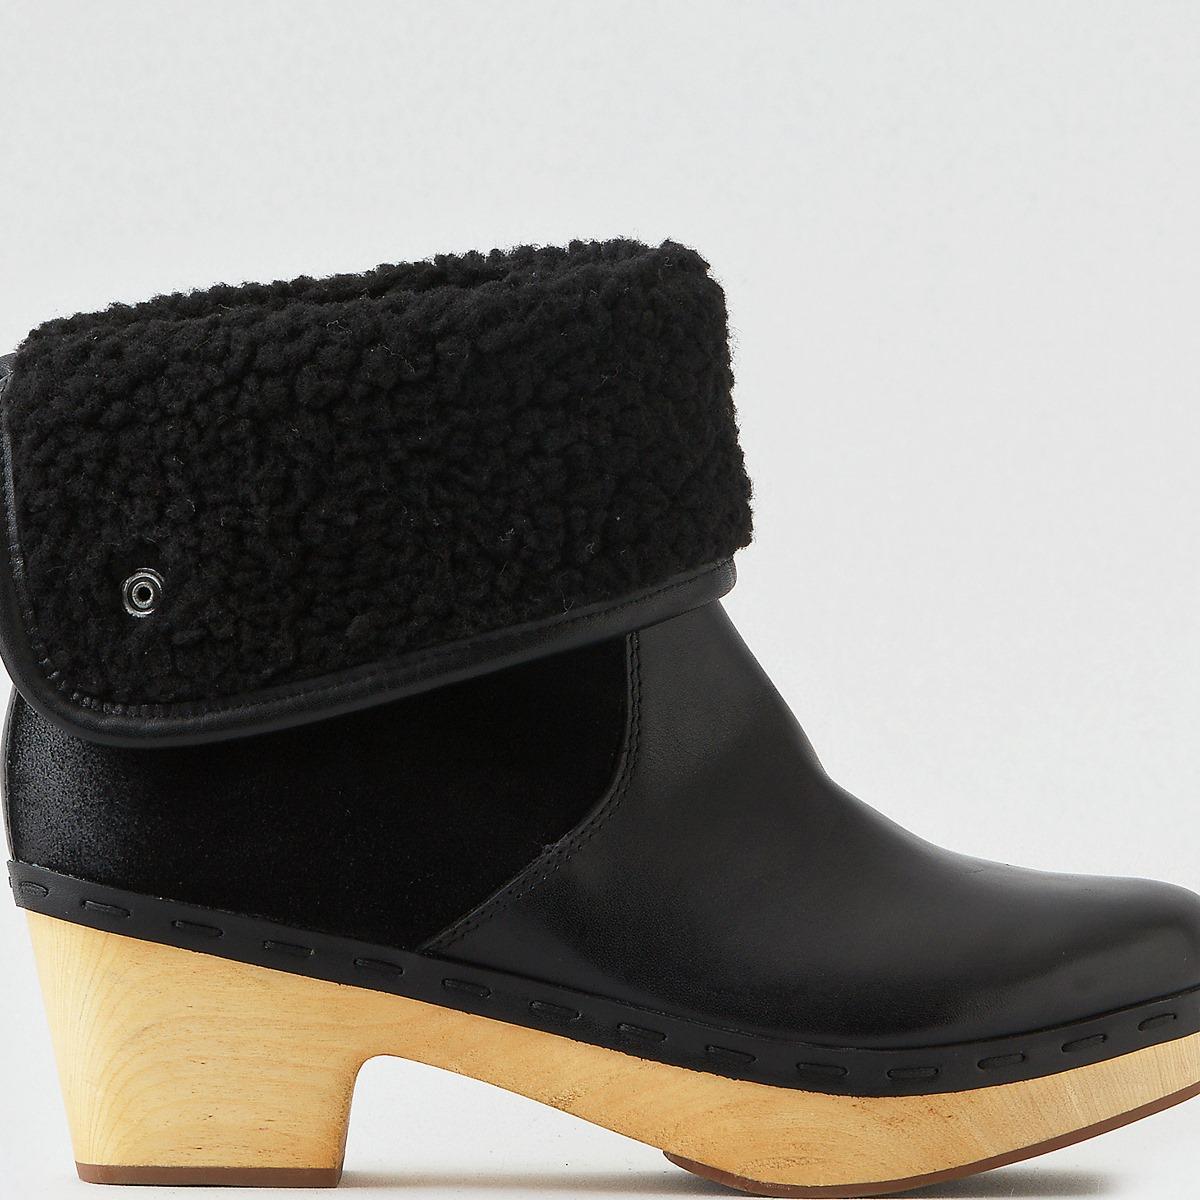 Frye & Co. Odessa Cuff Boot